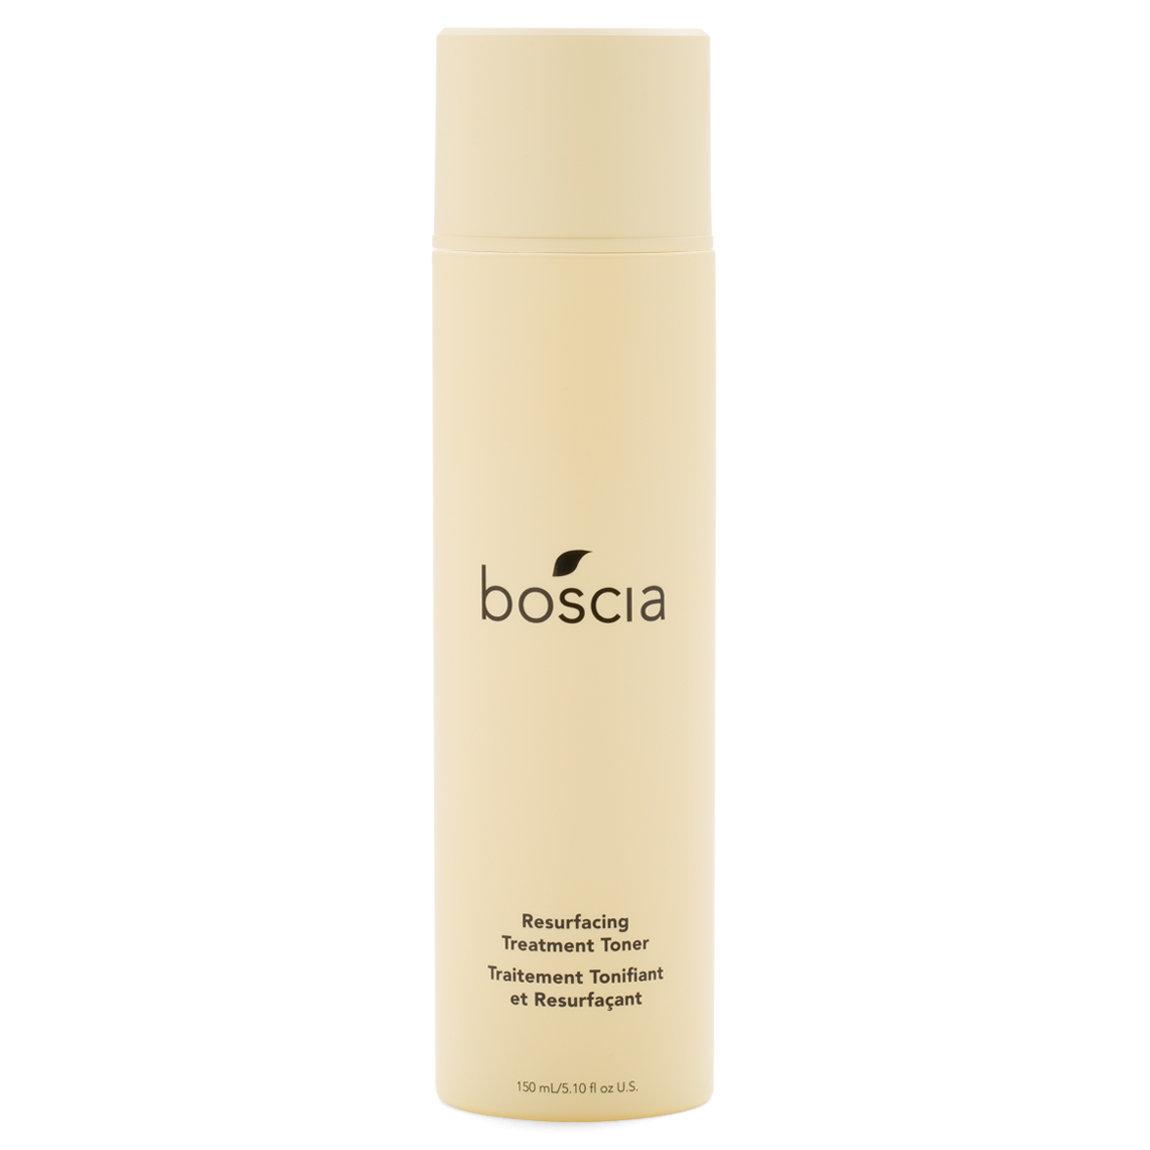 boscia Resurfacing Treatment Toner with Apple Cider Vinegar 150 ml alternative view 1 - product swatch.